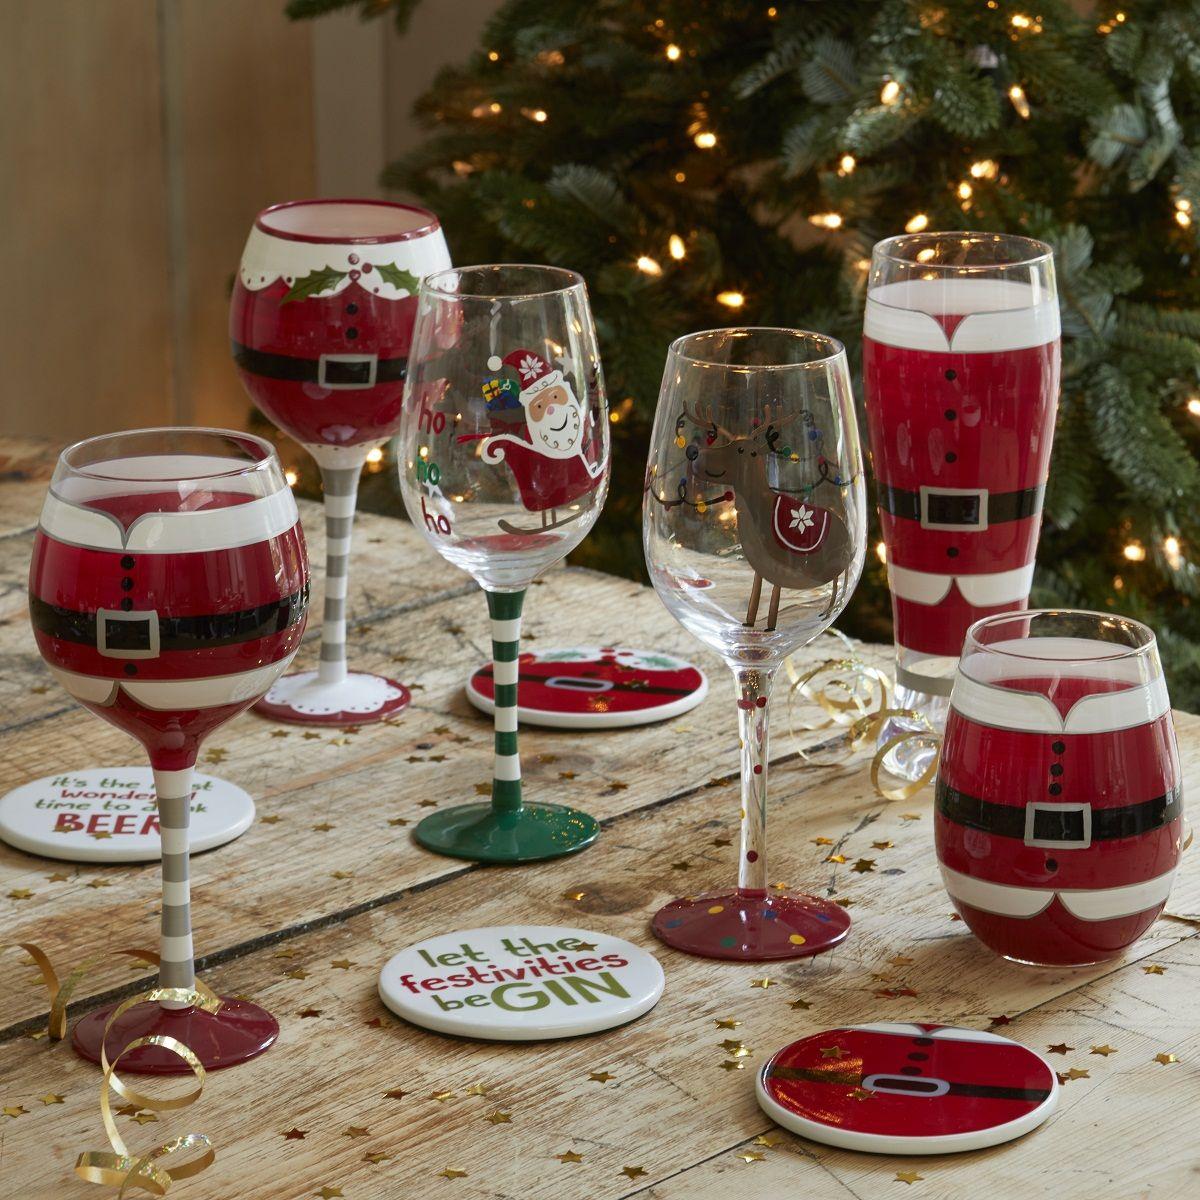 Shop All Drinking Glasses Single Sets Glasses Shop Christmas Inspiration Alcoholic Drinks